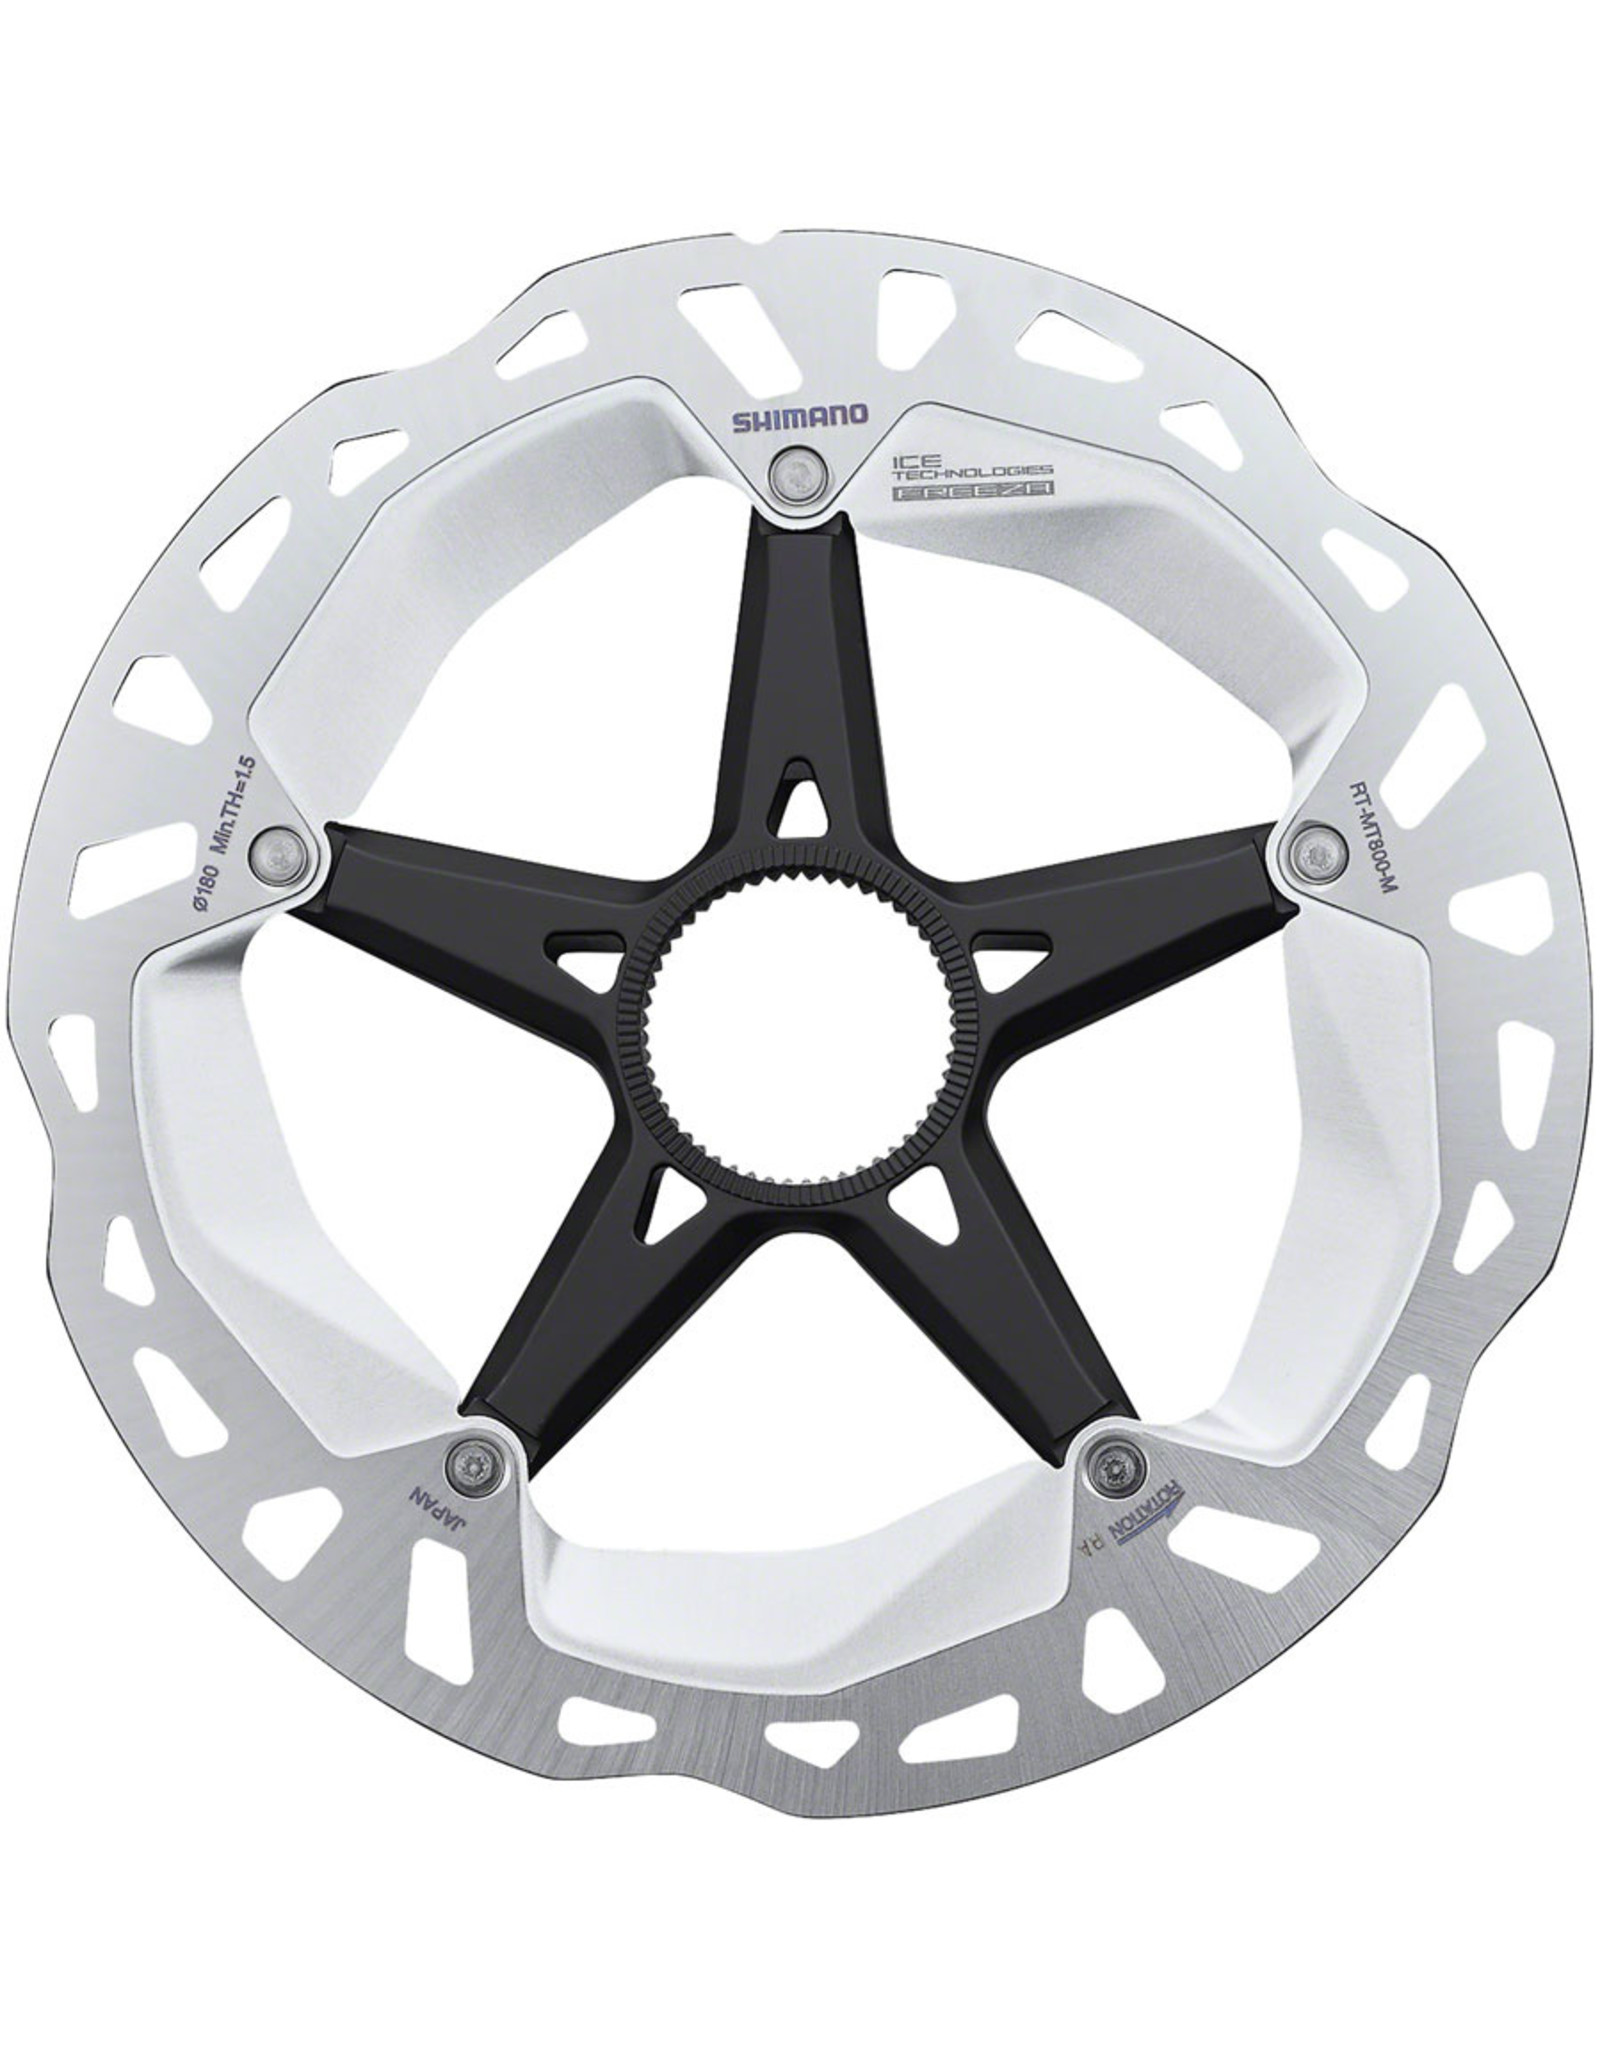 Shimano Shimano Deore XT RT-MT800-M Disc Brake Rotor with External Lockring - 180mm, Center Lock, Silver/Black